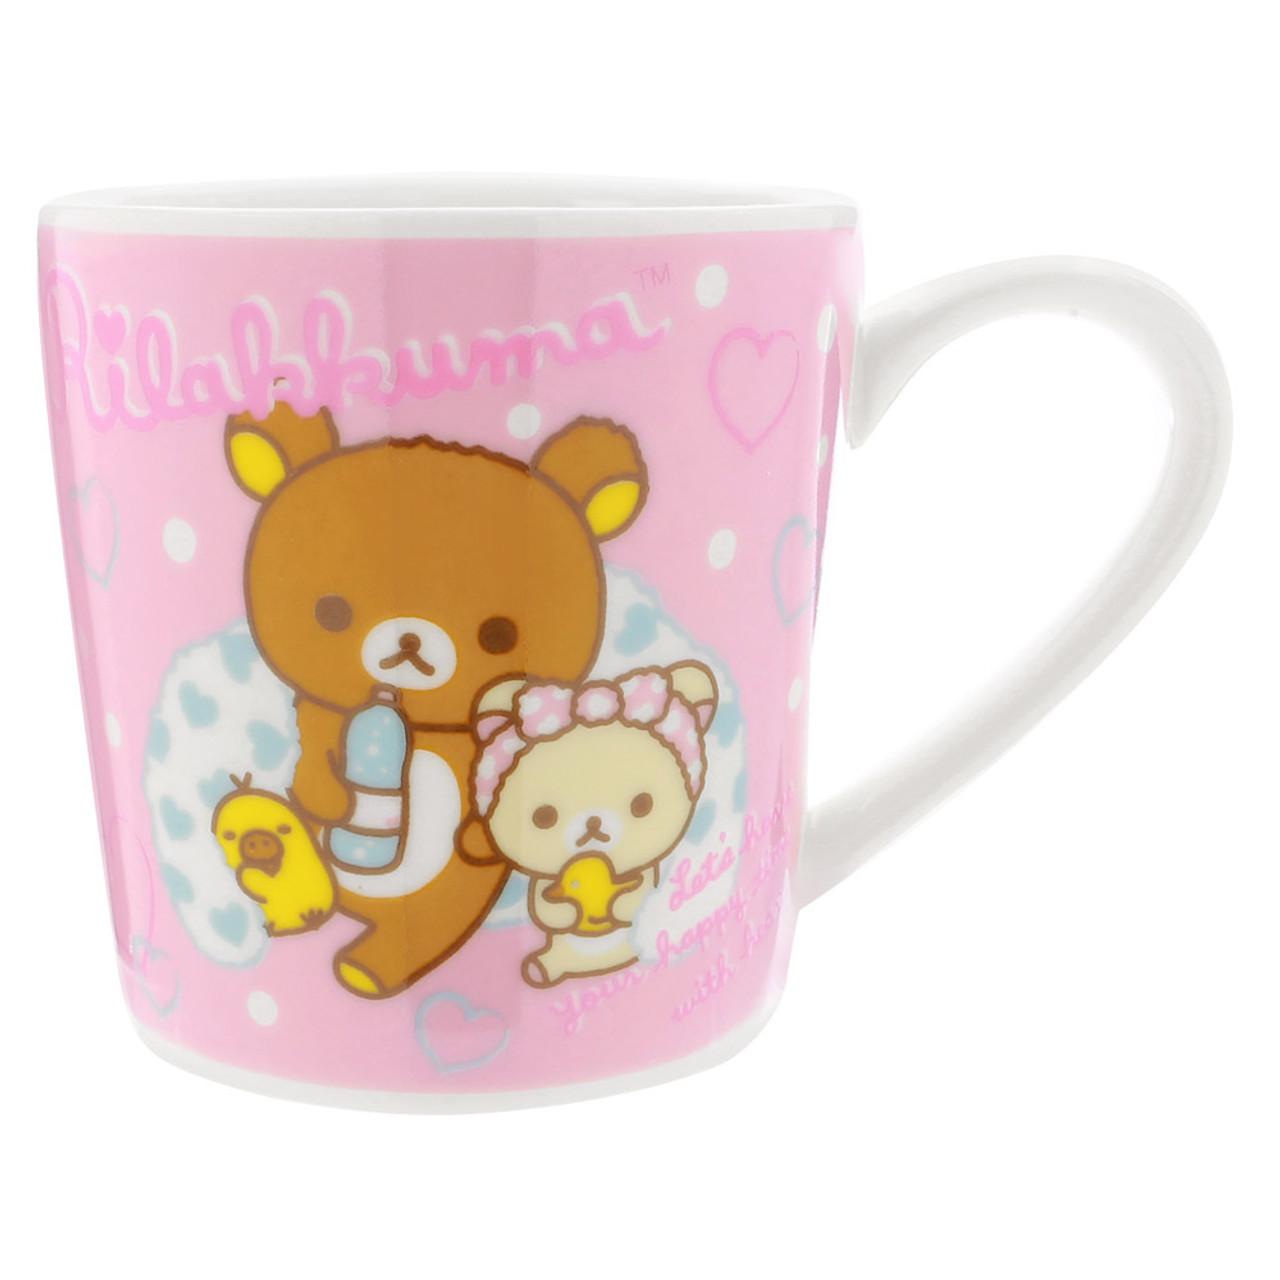 San-x Rilakkuma Bath Time Light Pink Ceramic Cup - Bubble ( Front View )